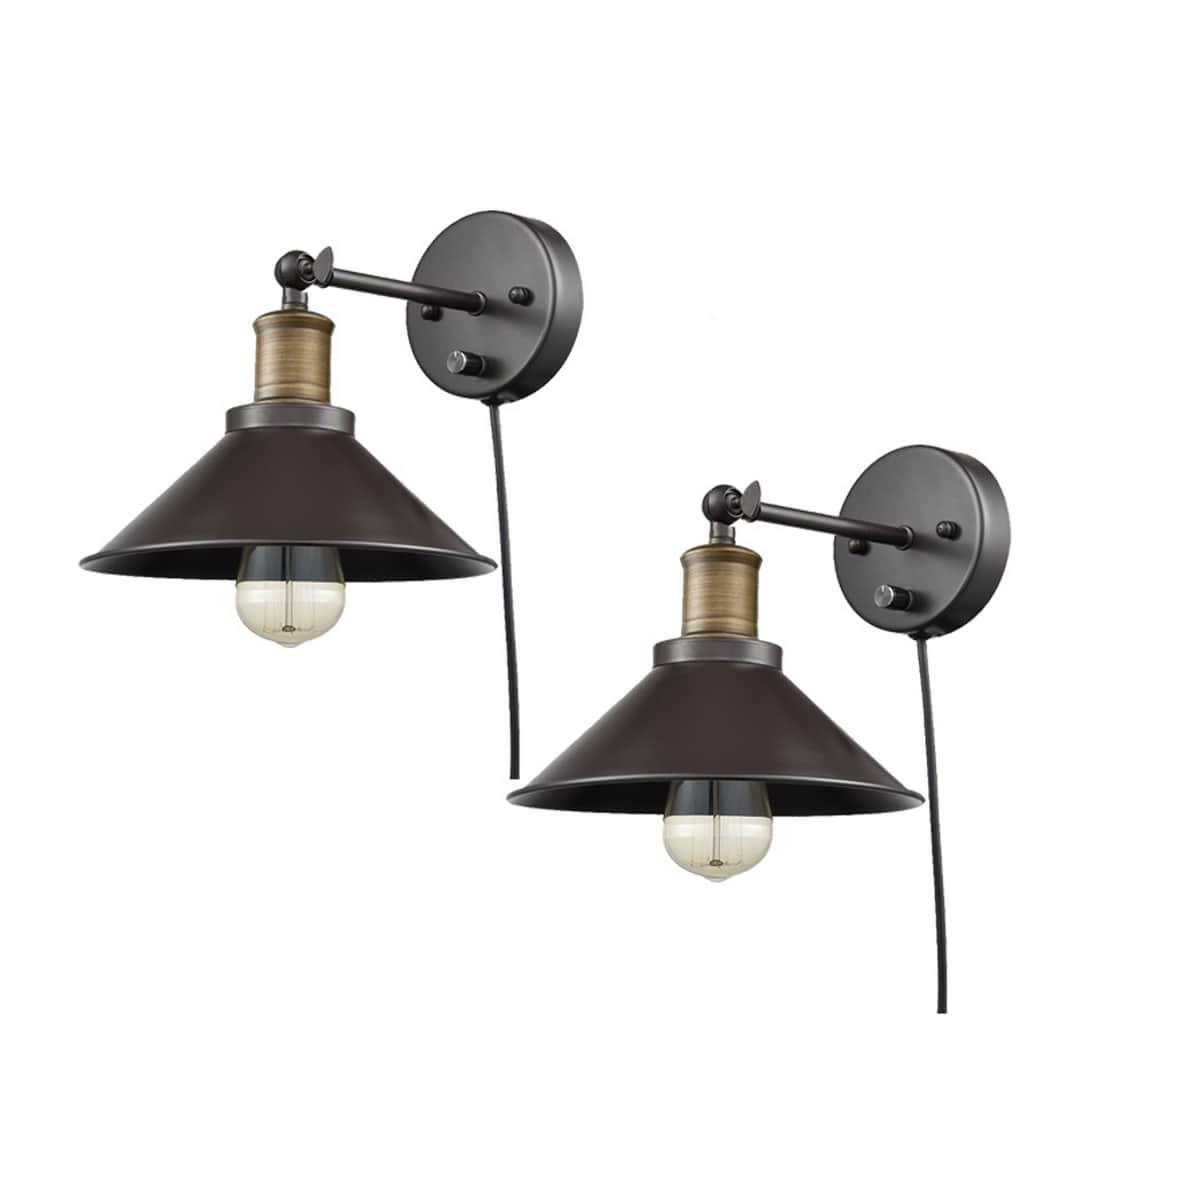 Industrial Bronze Swing Arm Plug-in Wall Lights 2 Pack